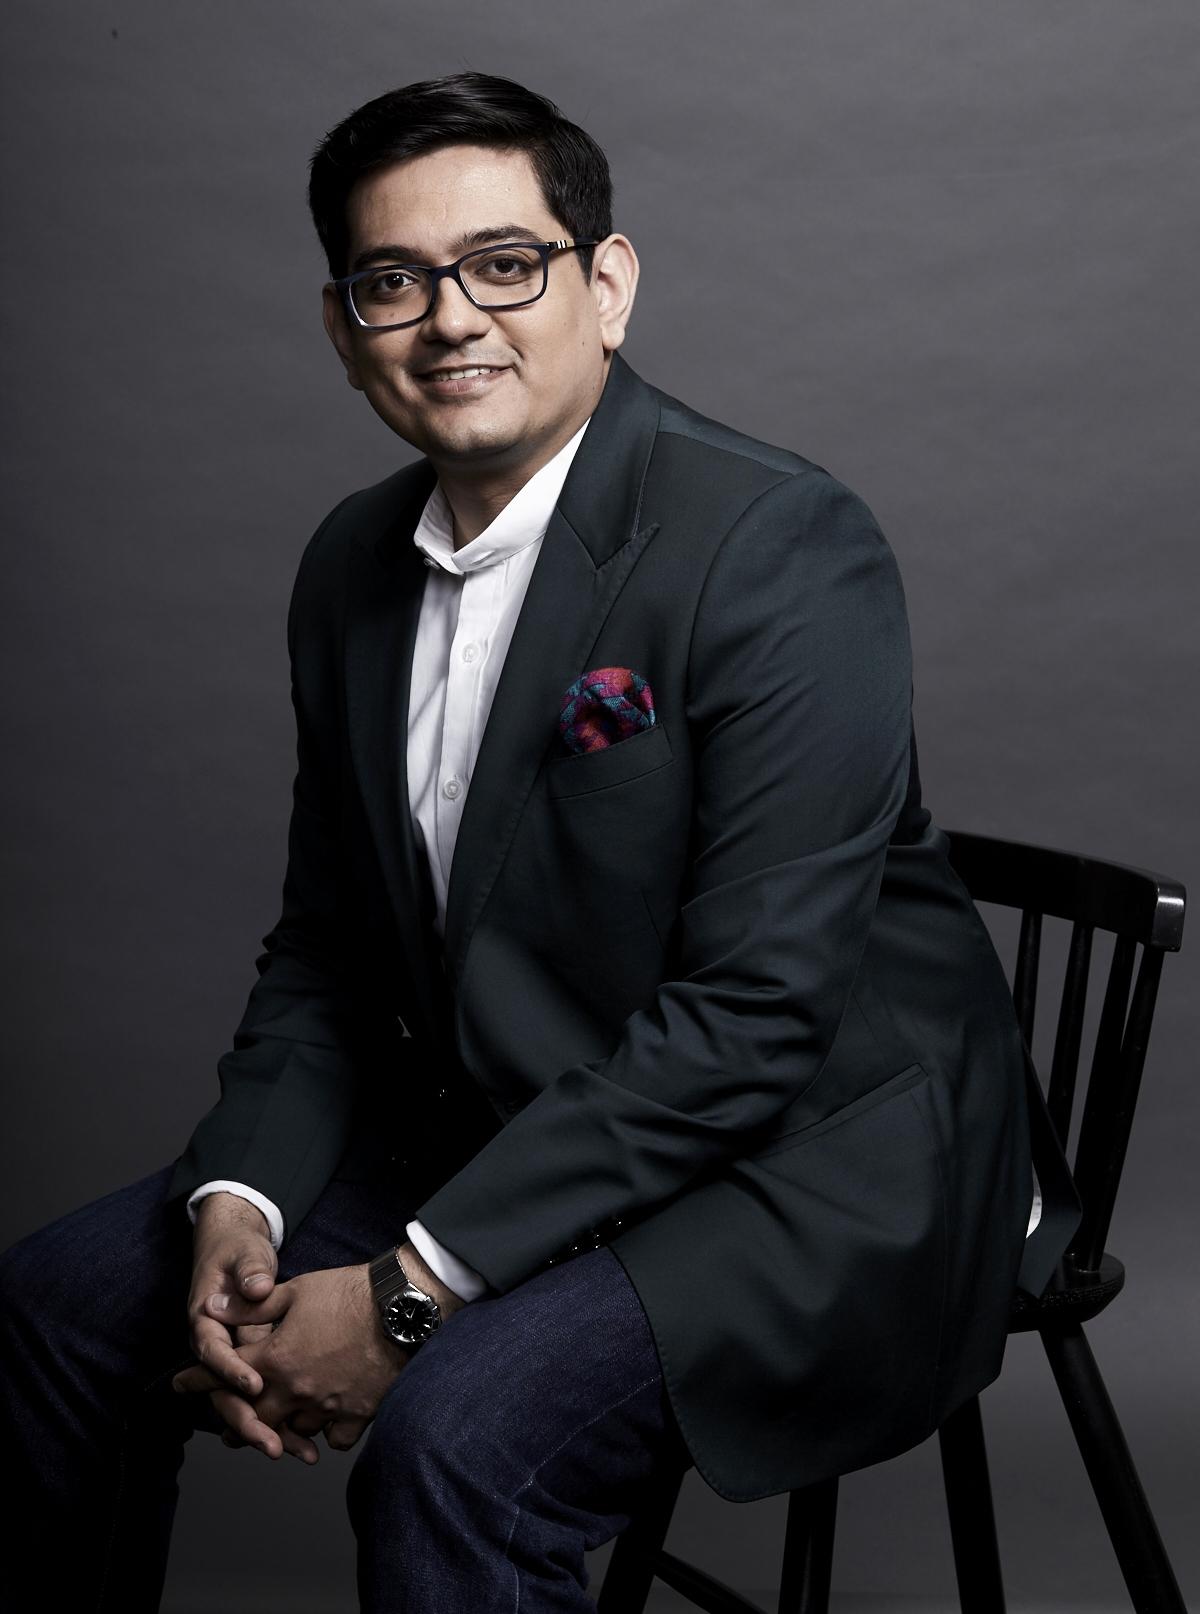 Pratik Gupta, Co-Founder, FoxyMoron